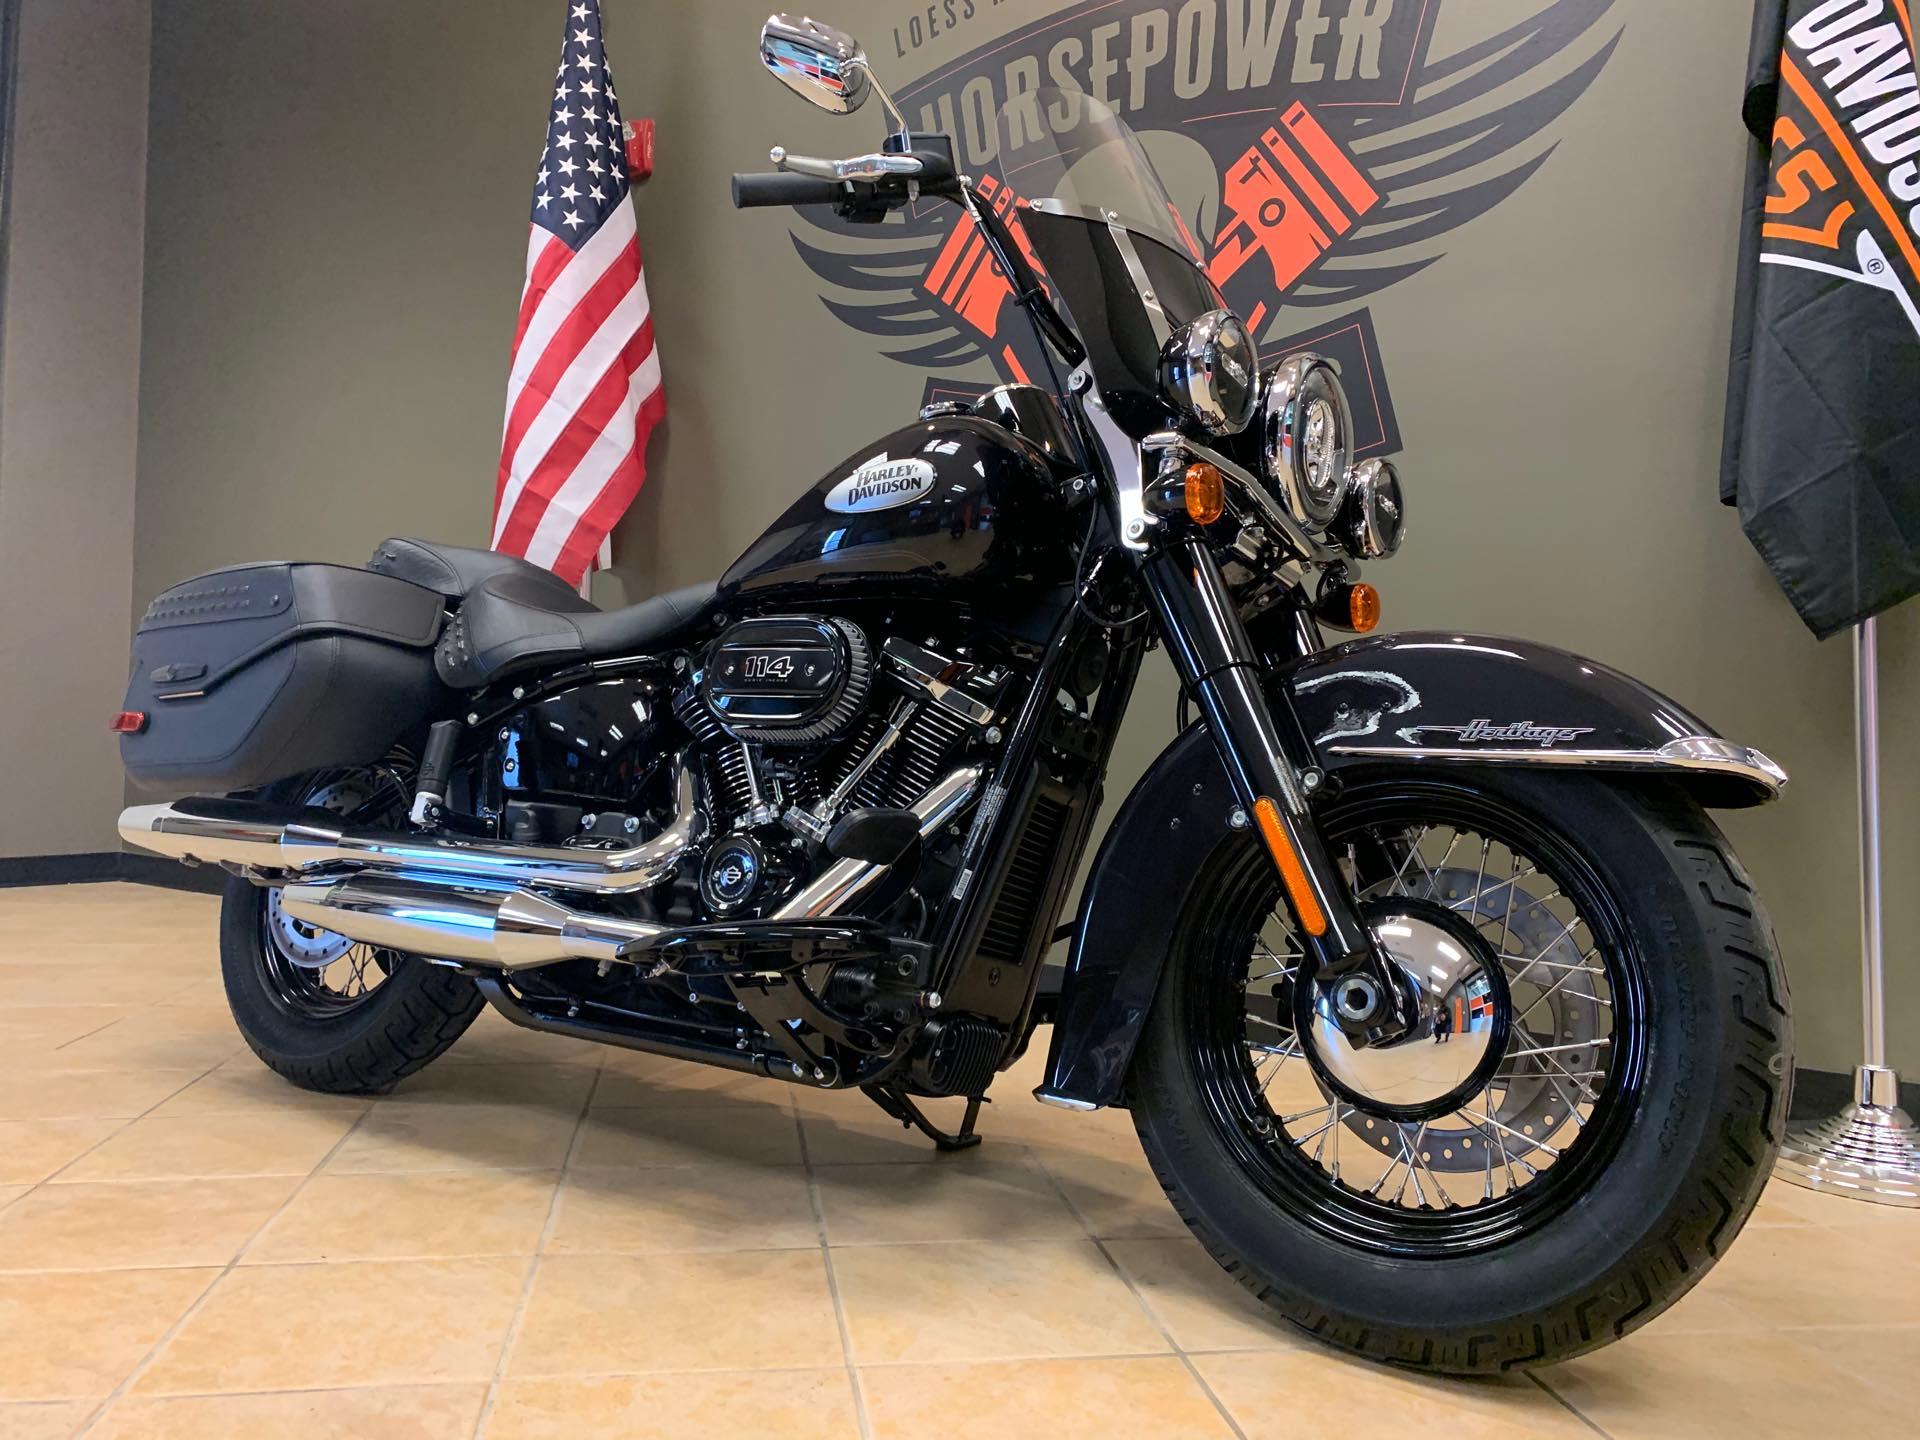 2021 Harley-Davidson Touring FLHCS Heritage Classic 114 at Loess Hills Harley-Davidson